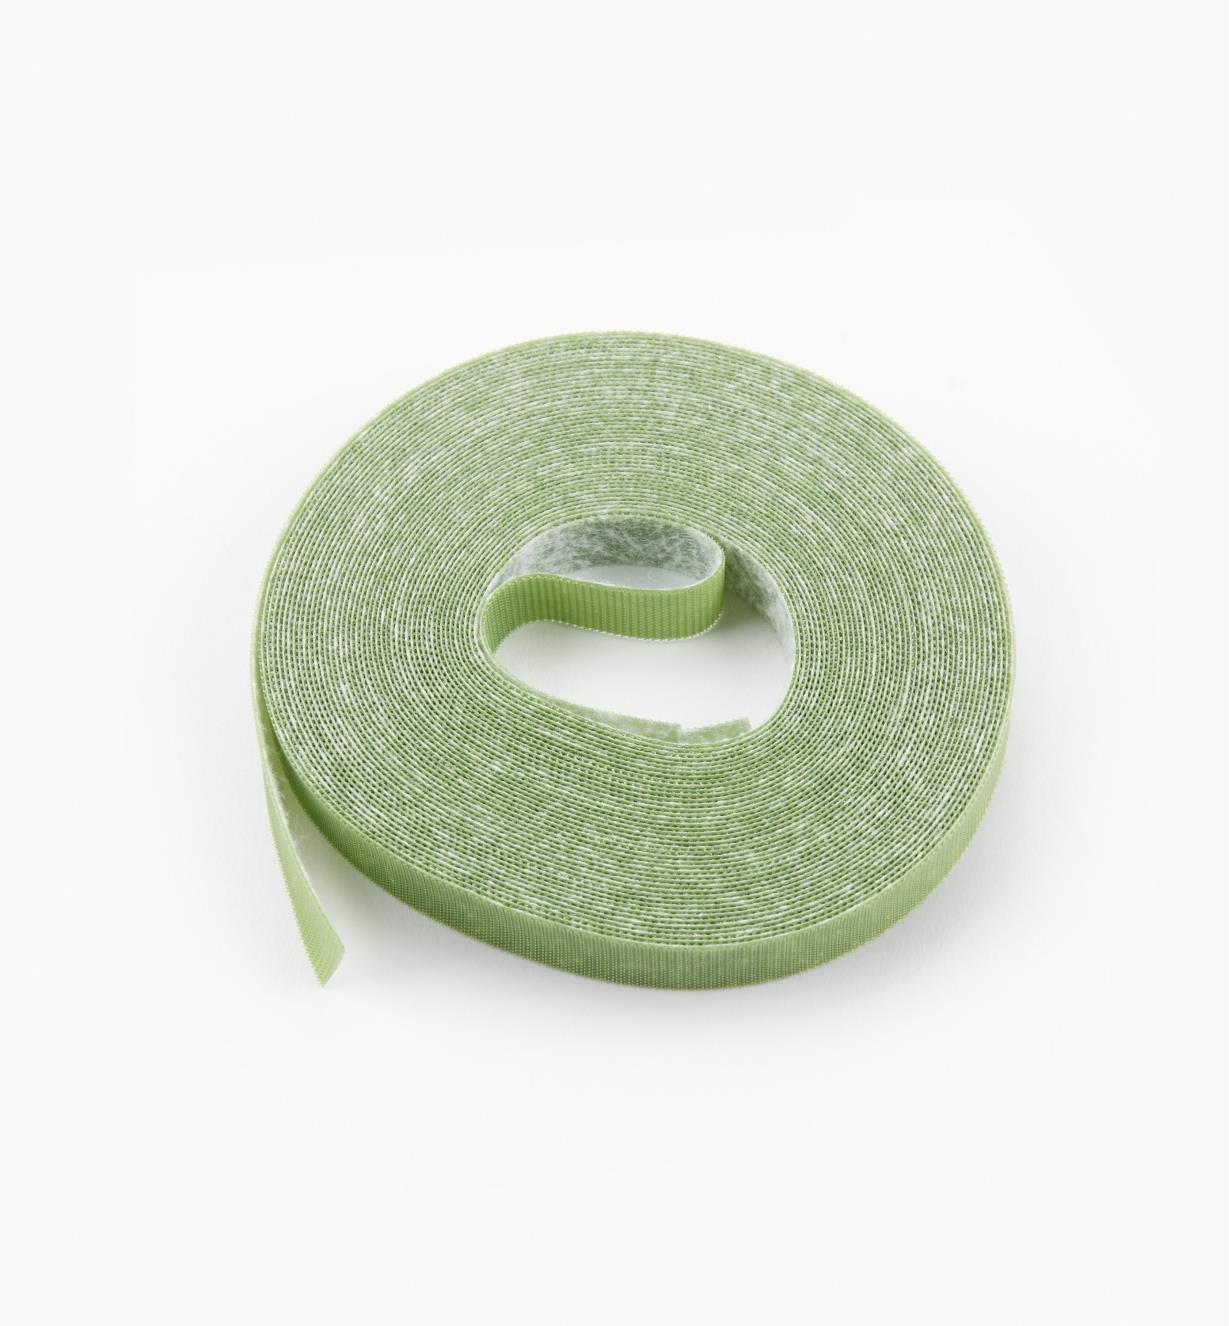 EA175 - 30' VELCRO Brand Plant Tie Roll, each